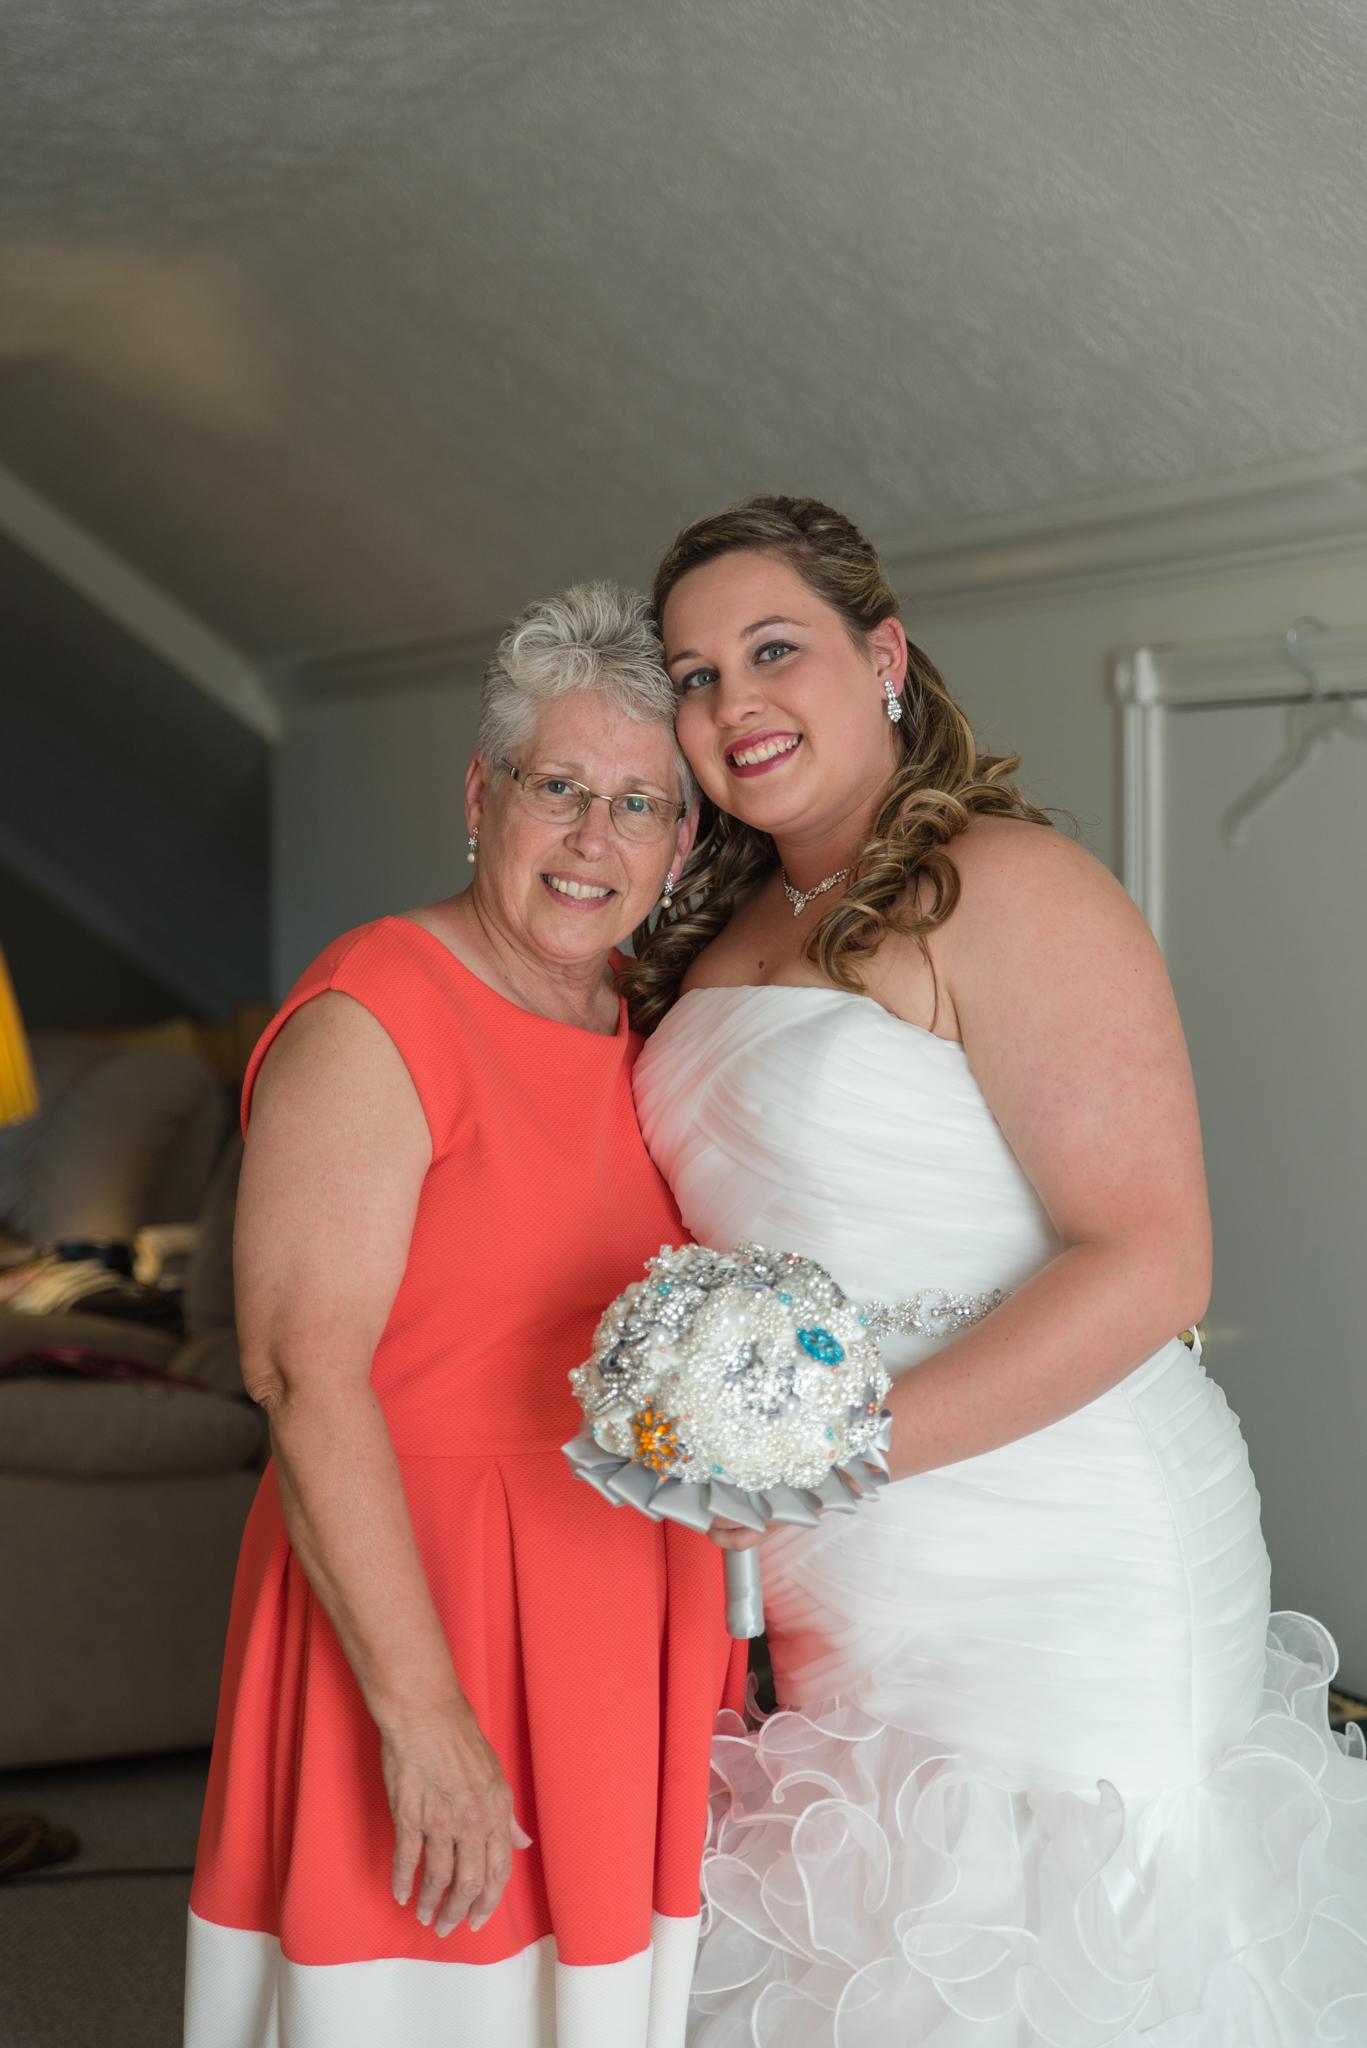 Winchester KY wedding photos, KY bride, KY wedding, Kentucky wedding photographer